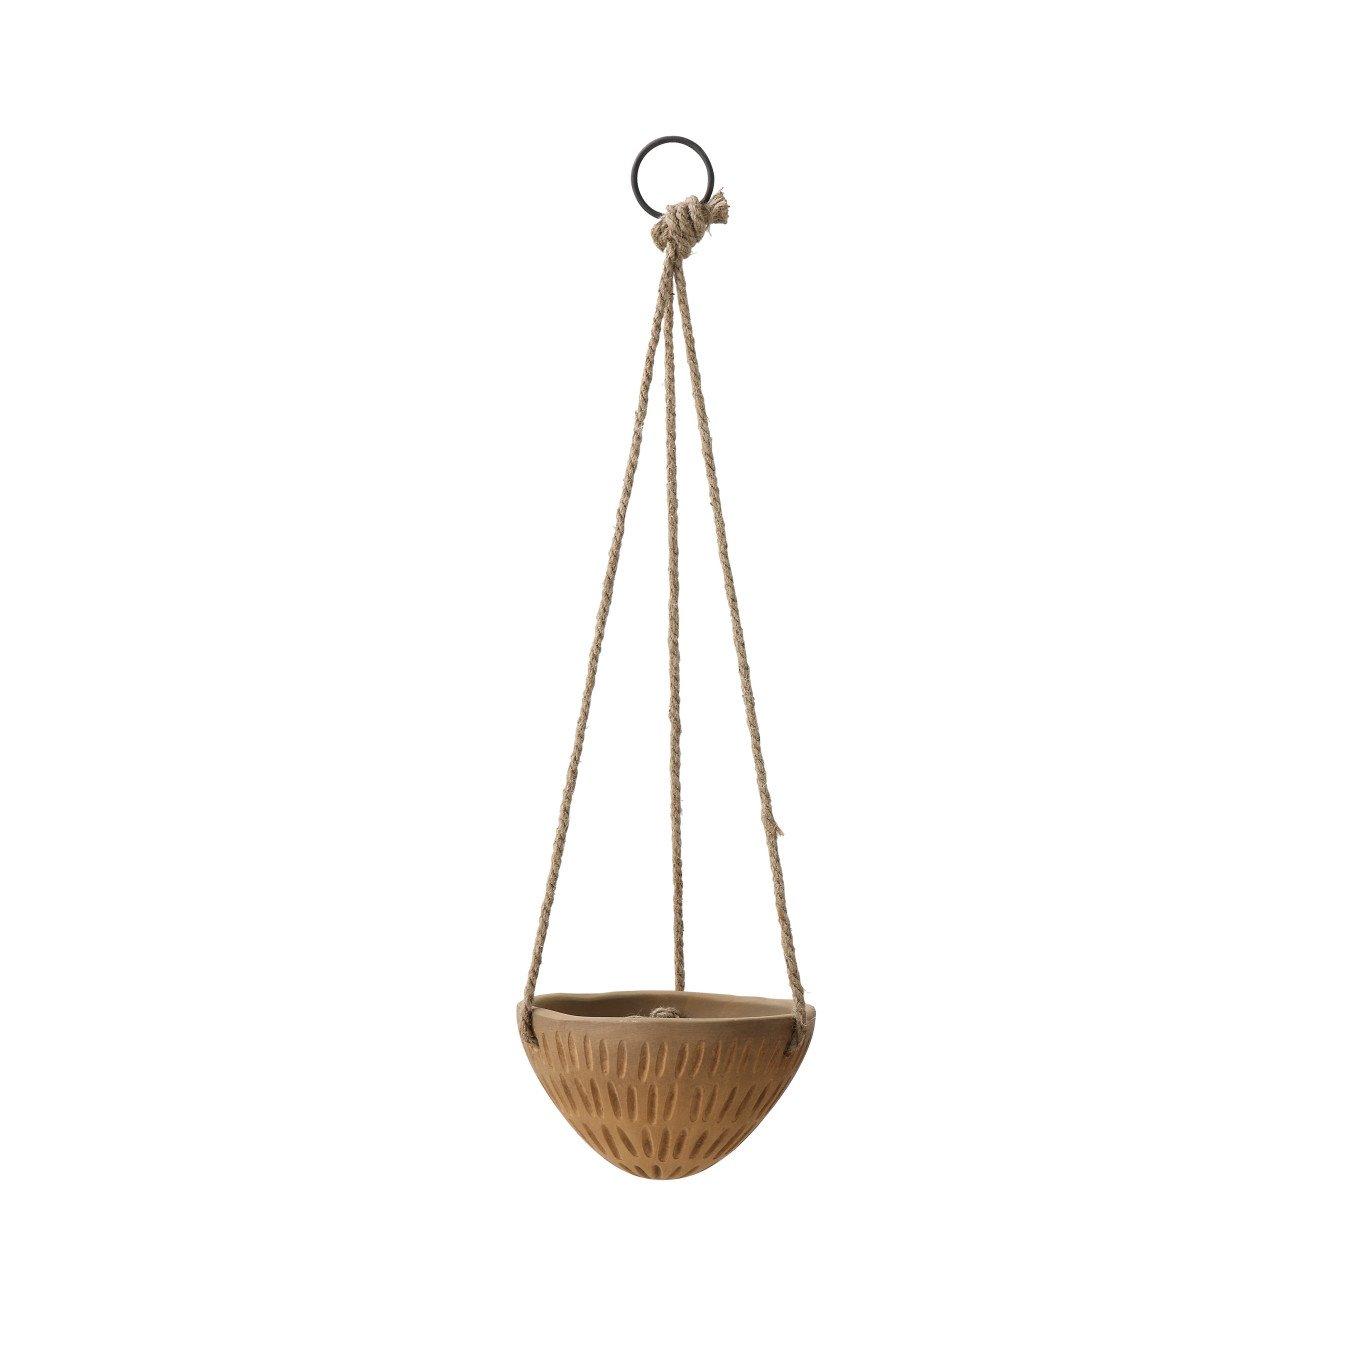 Round Terracotta Planter with Jute Hanger